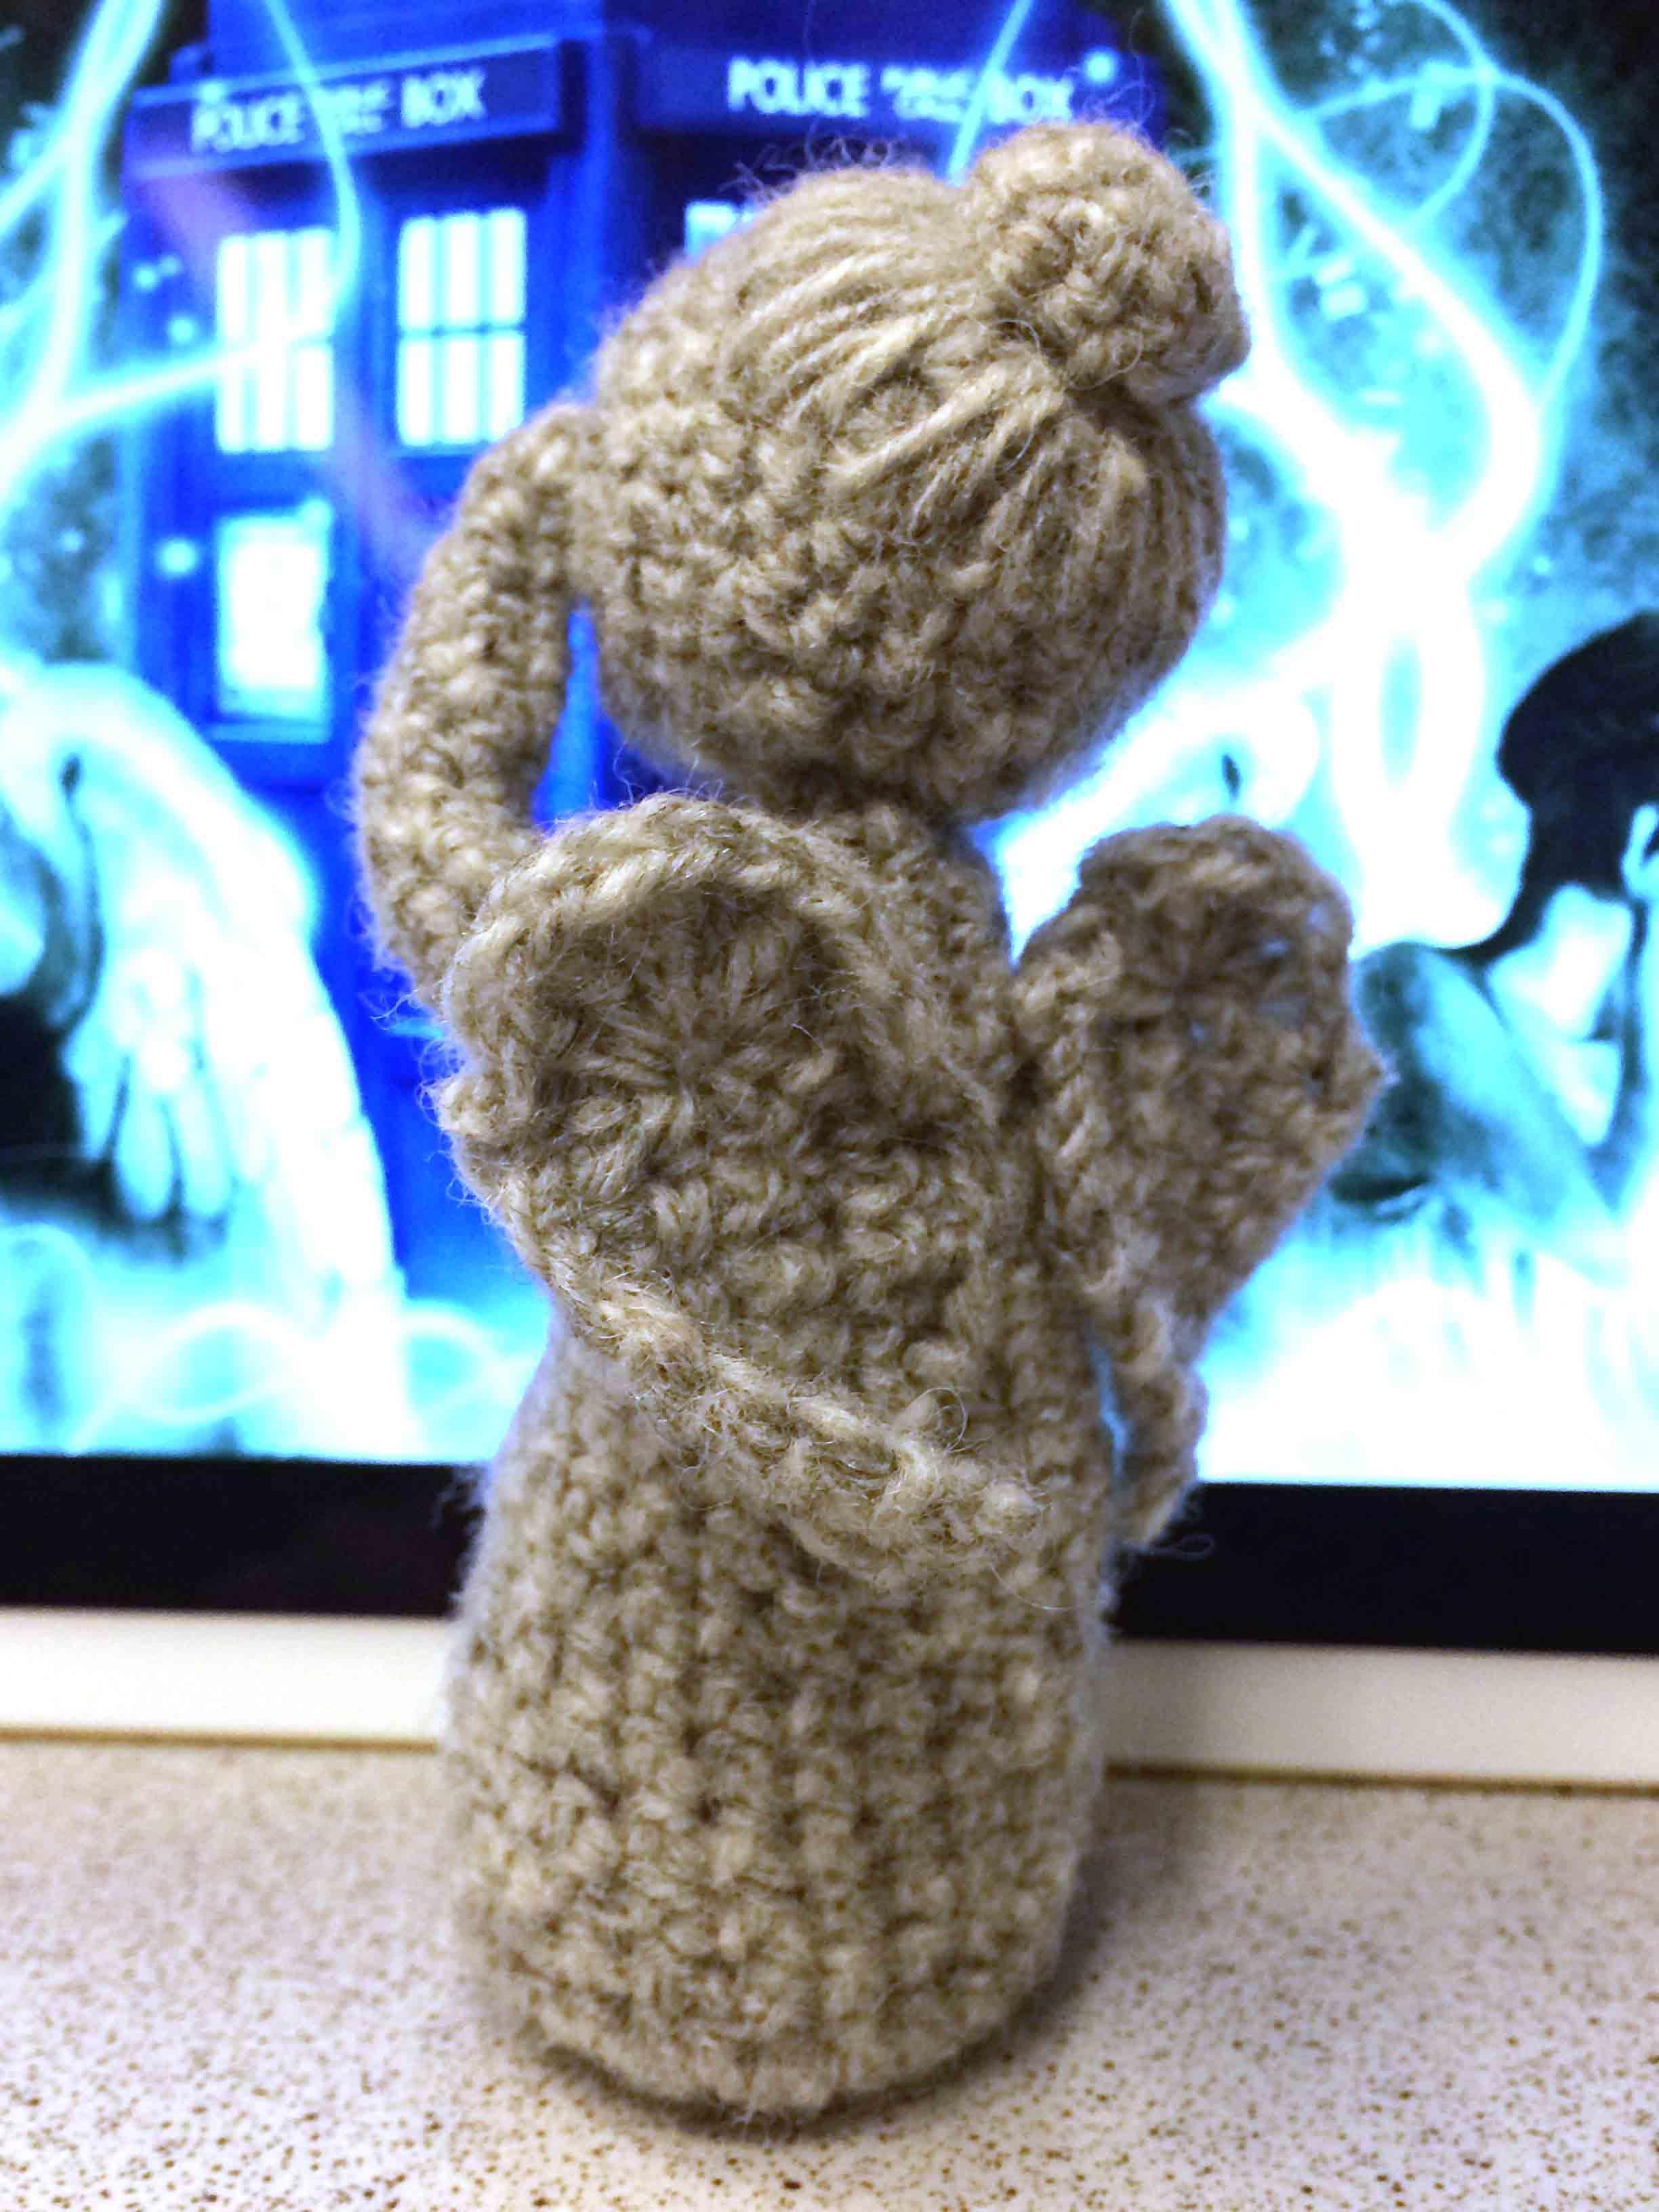 Doctor Who Weeping Angel amigurumi | Weeping Angel amigurumi… | Flickr | 1333x1000